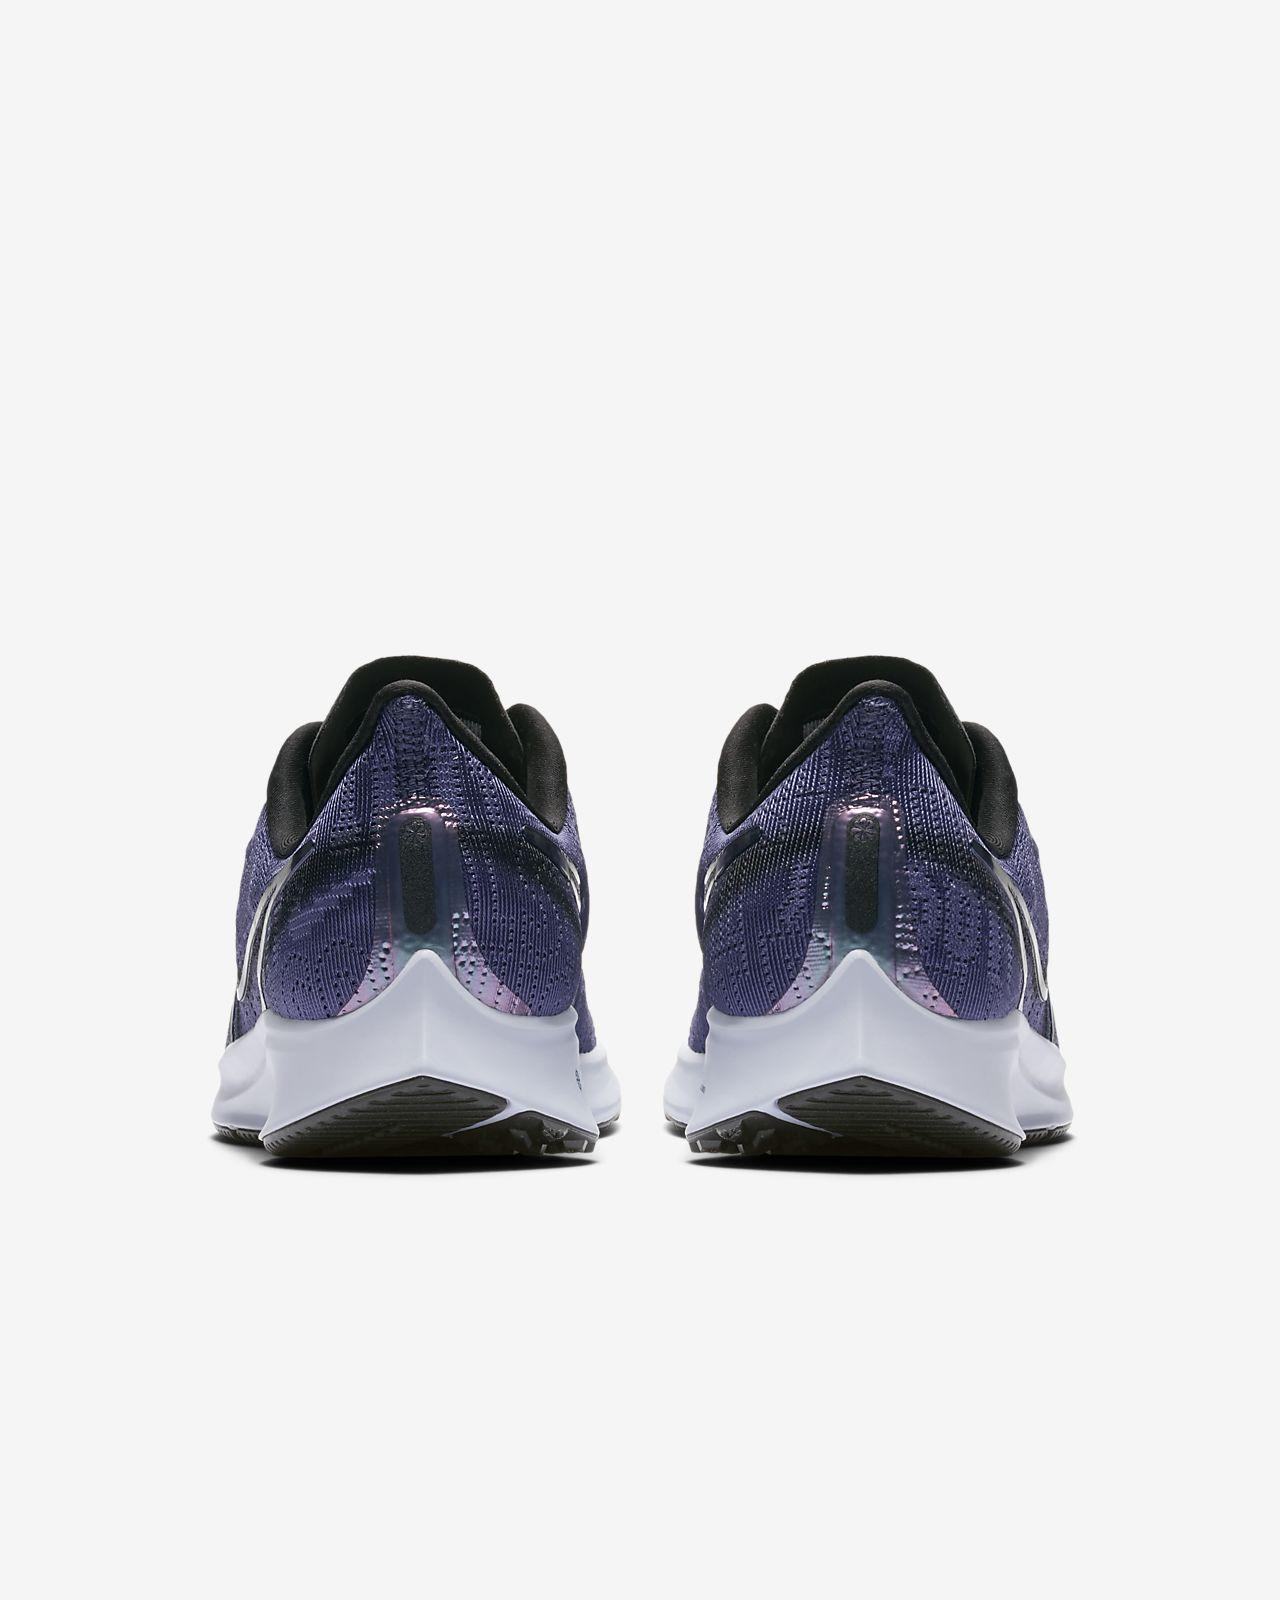 Nike Air Zoom Pegasus 36 Premium Rise női futócipő. Nike HU